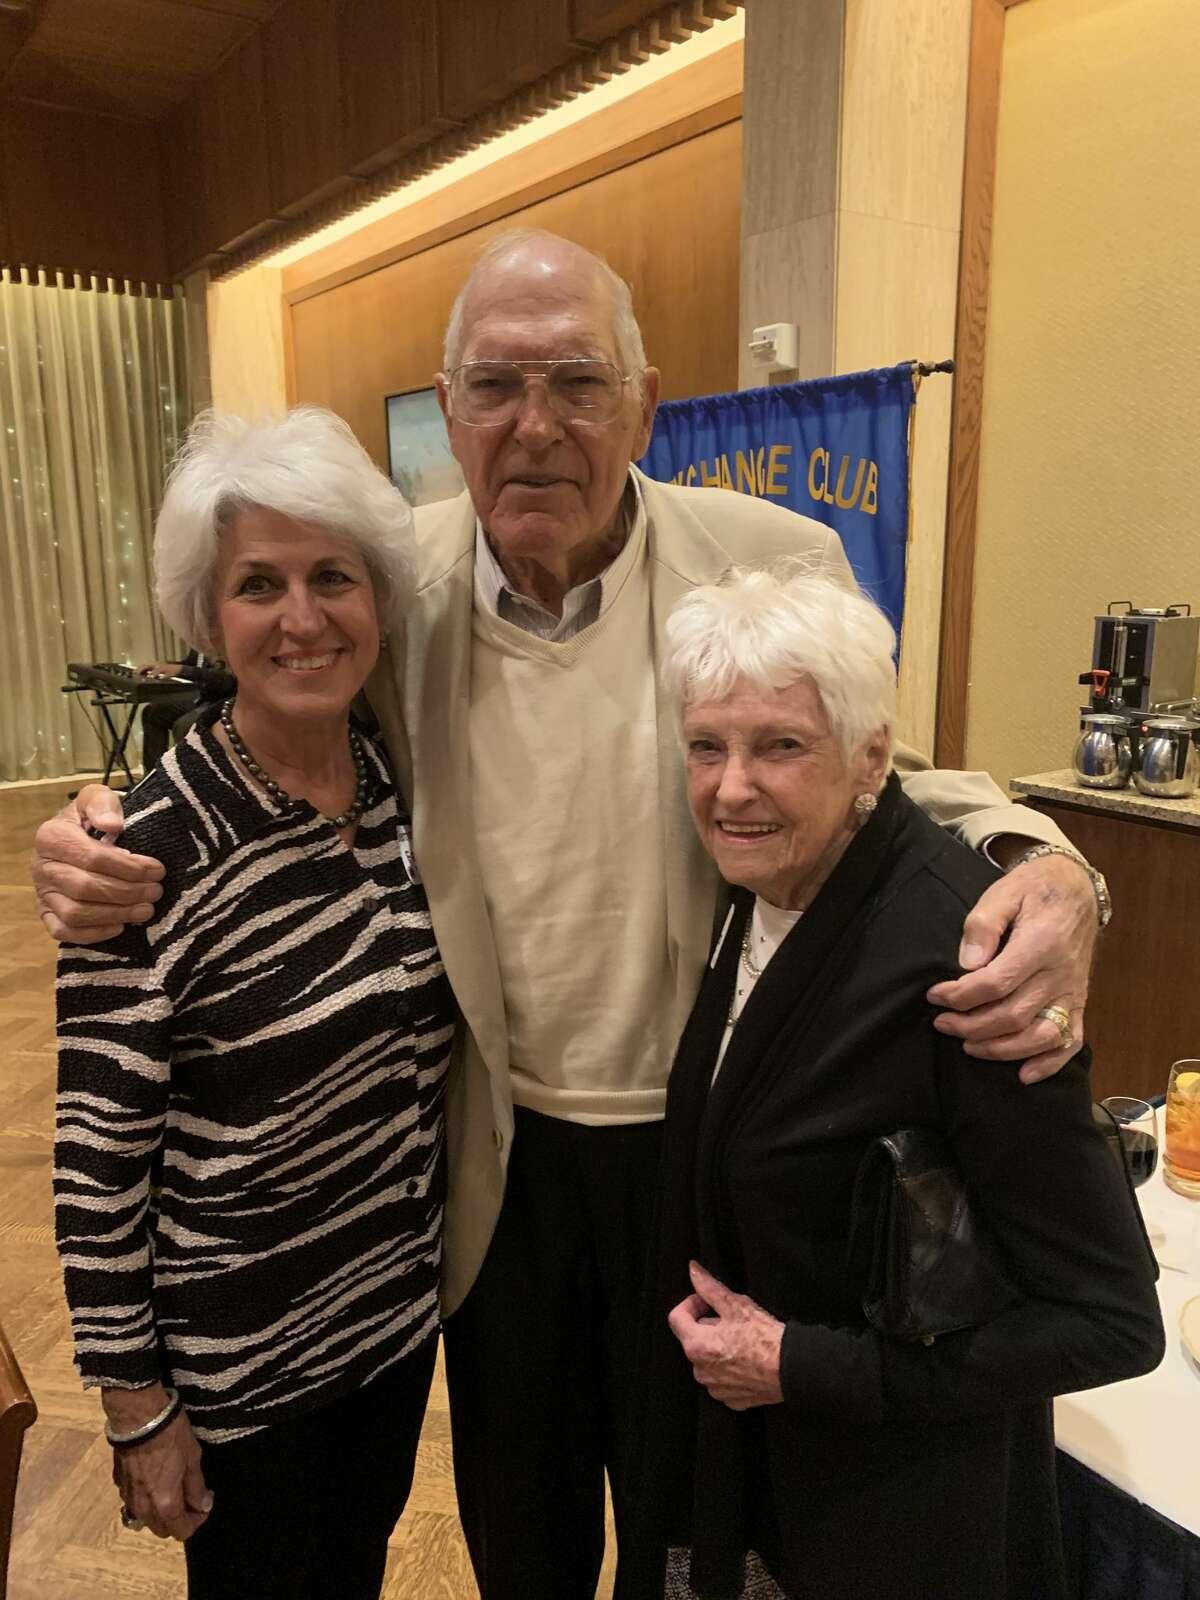 Golden Deeds: Bernadette Fanning, from left, and Bob and Betty Reimers